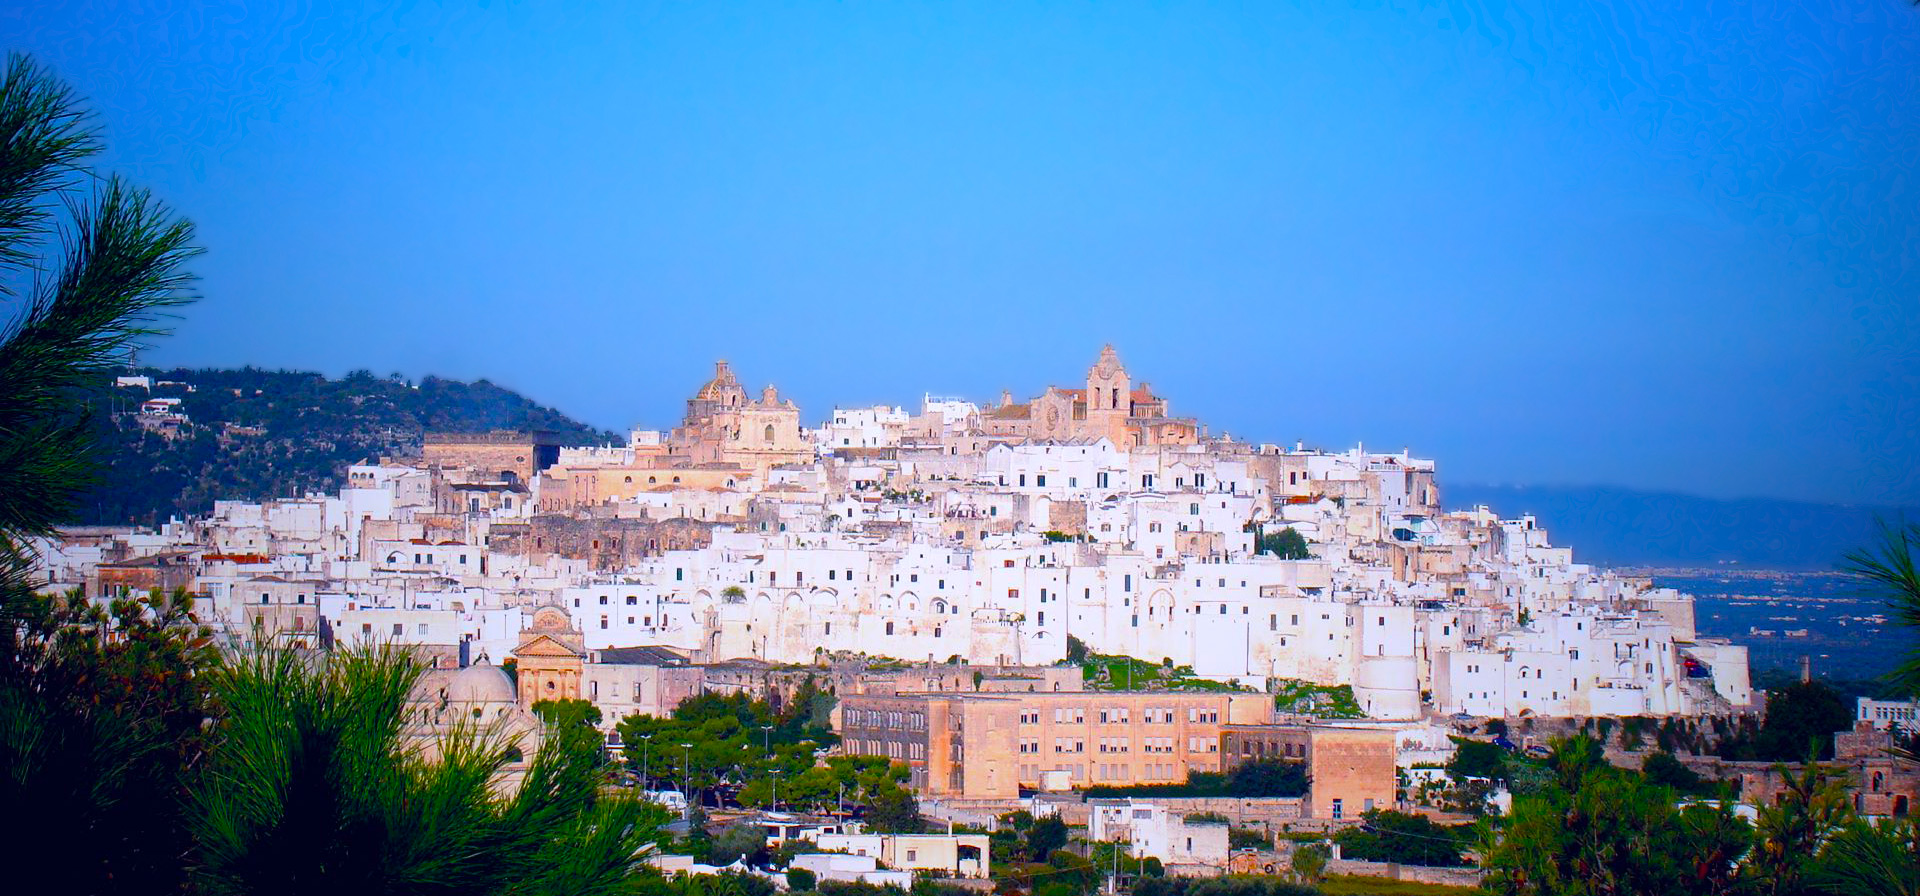 apulia-slow-travel-Ostuni-citta bianca-white city-die weisse stadt-itria valley-itria tal-valle d'itria-murgia